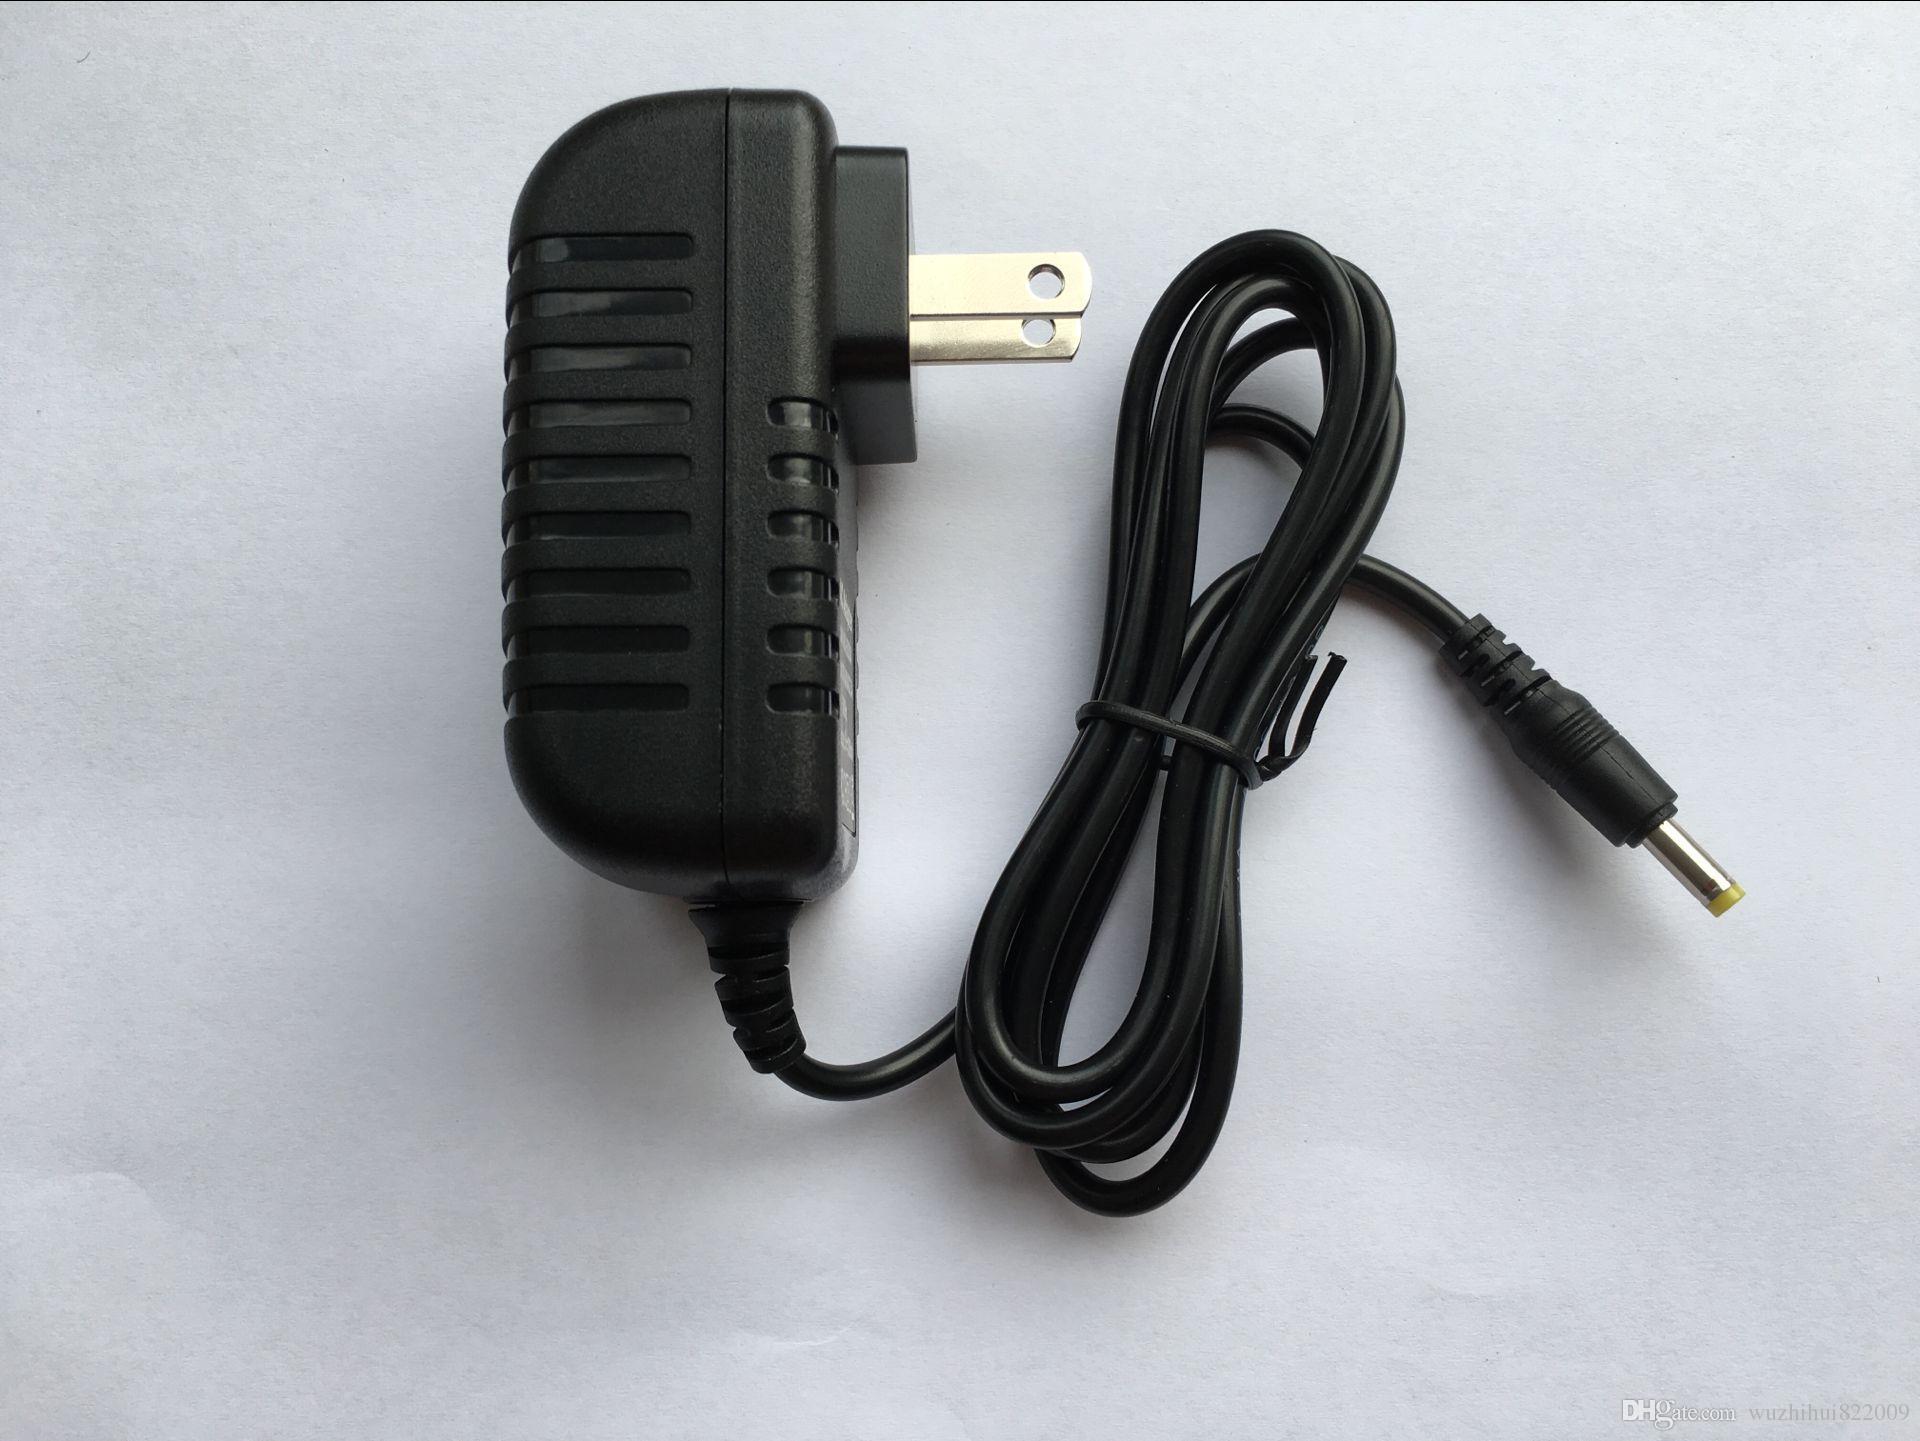 AC supply DC 5V 3A Switching Power Adapter 3000mA 15W US plug DC 3.5mm x 1.35mm